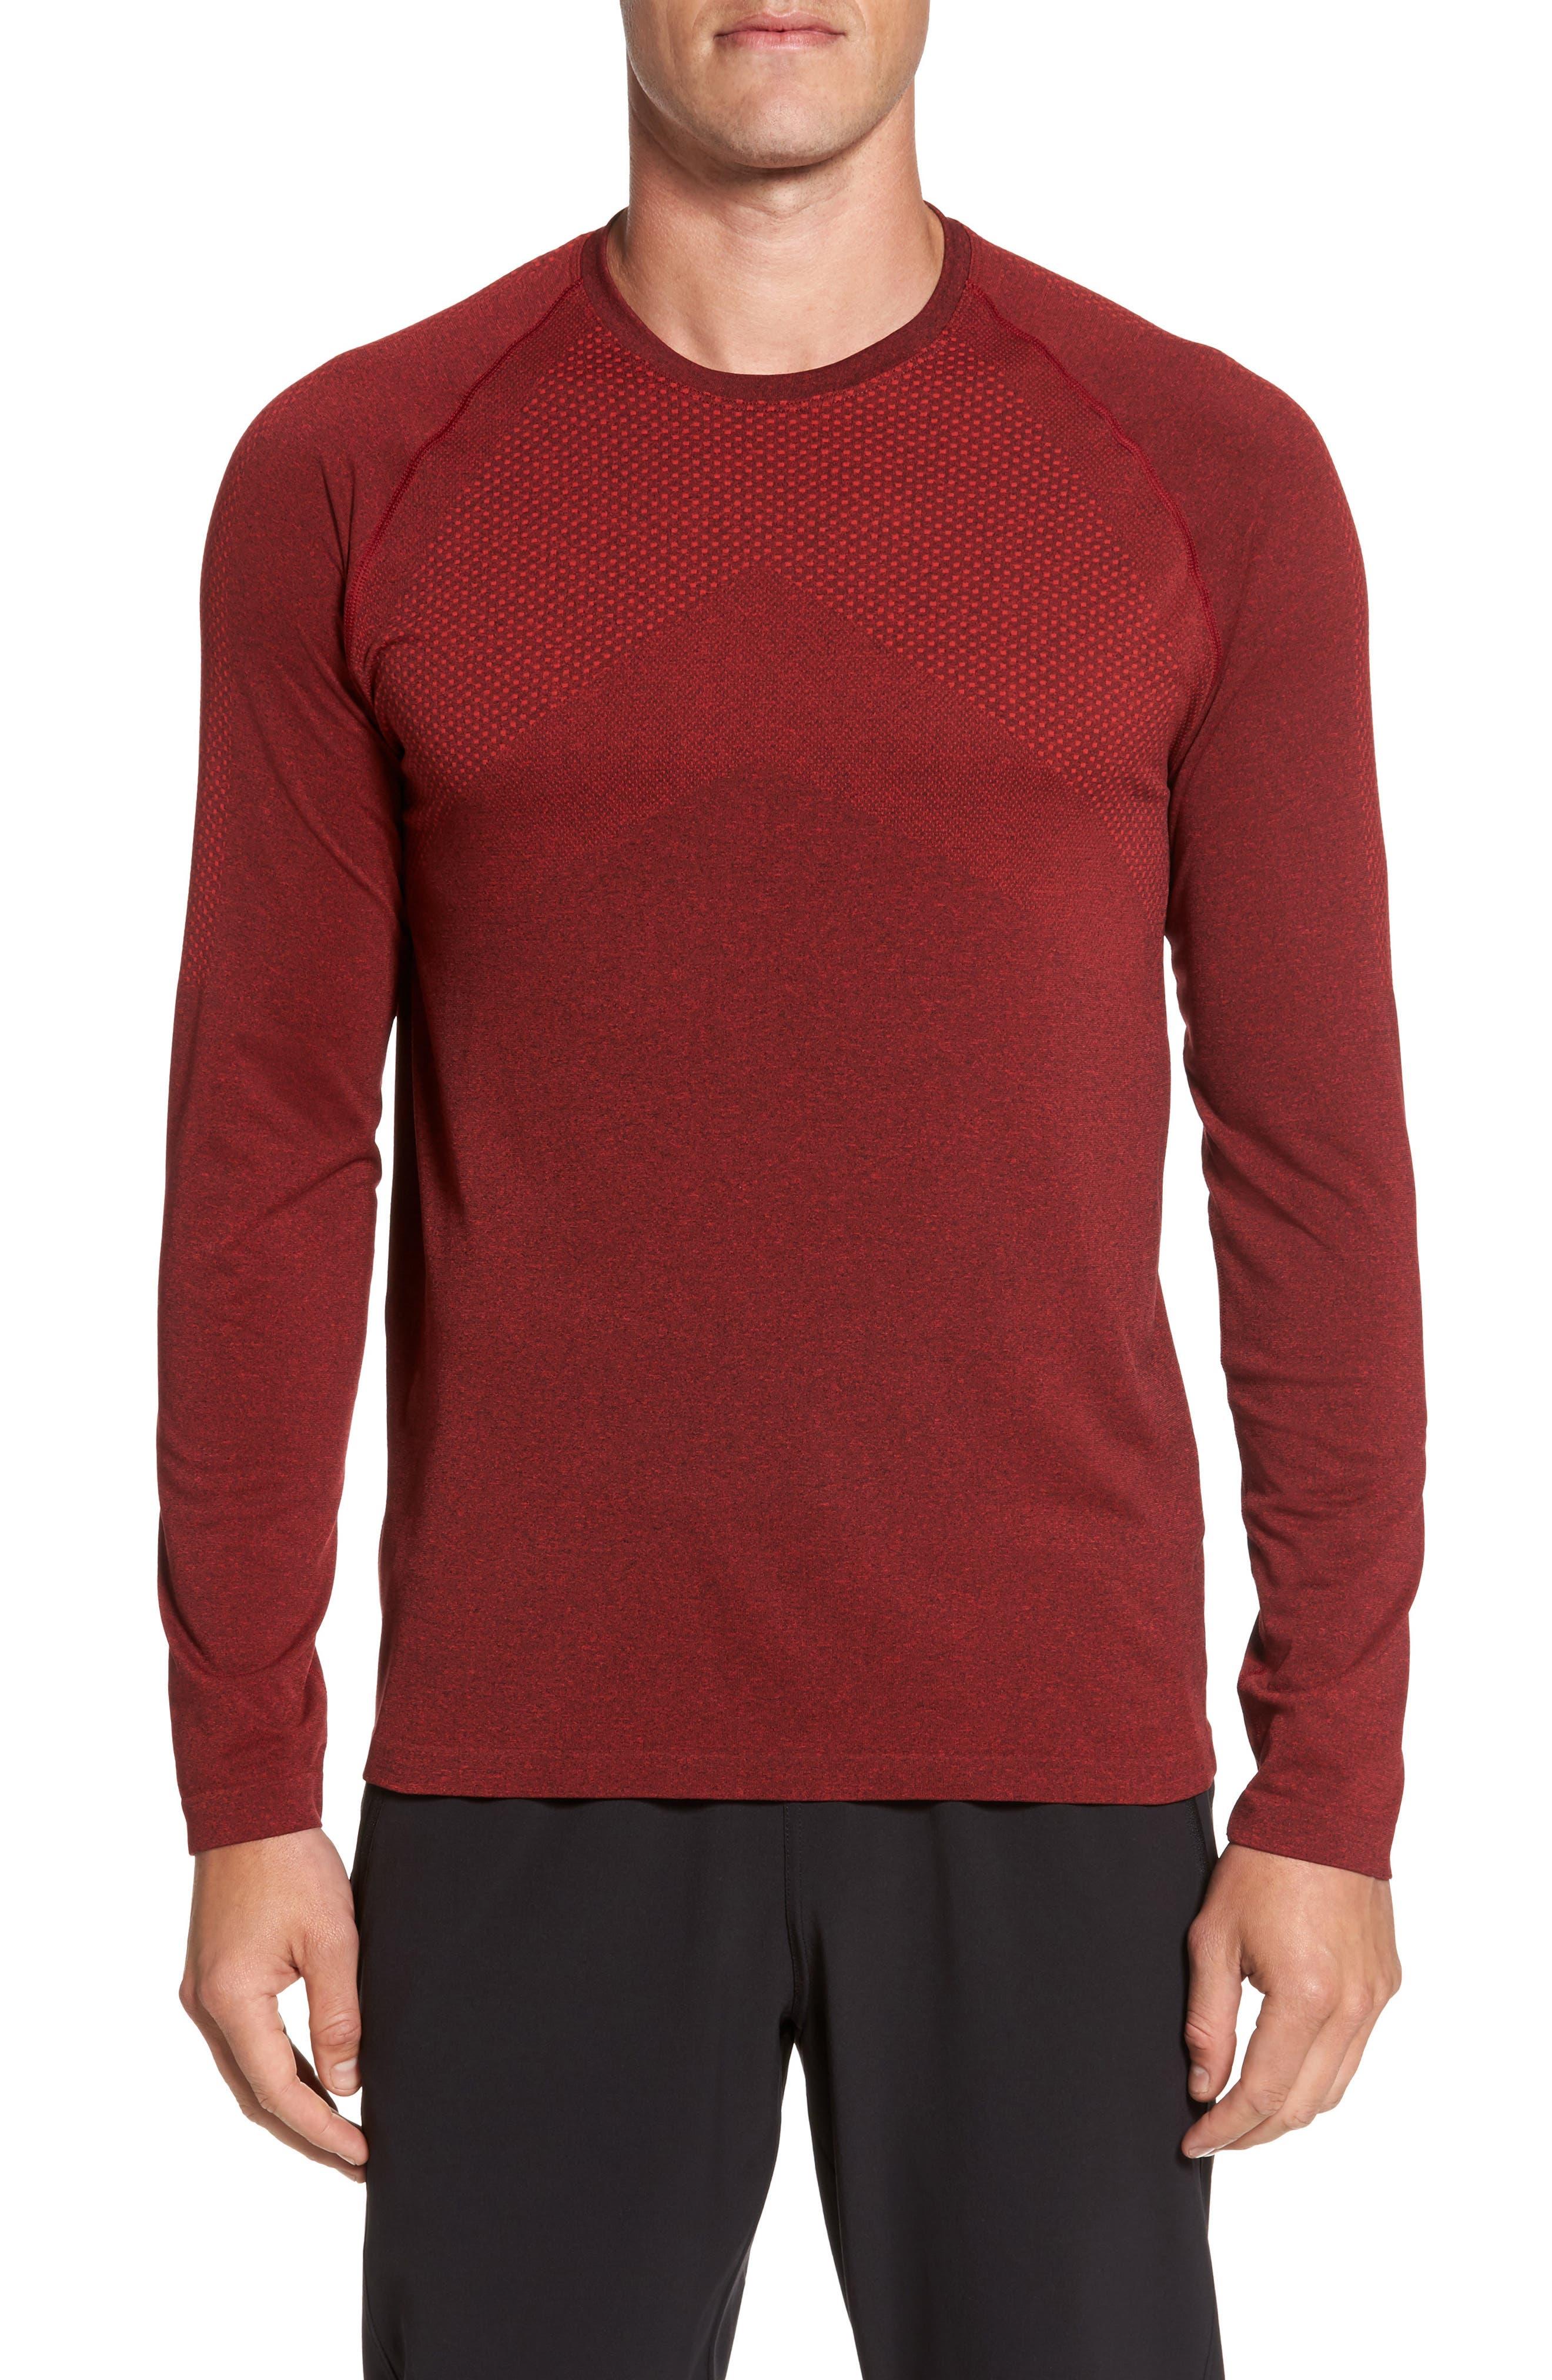 Main Image - Zella Zeolite Long Sleeve Performance T-Shirt